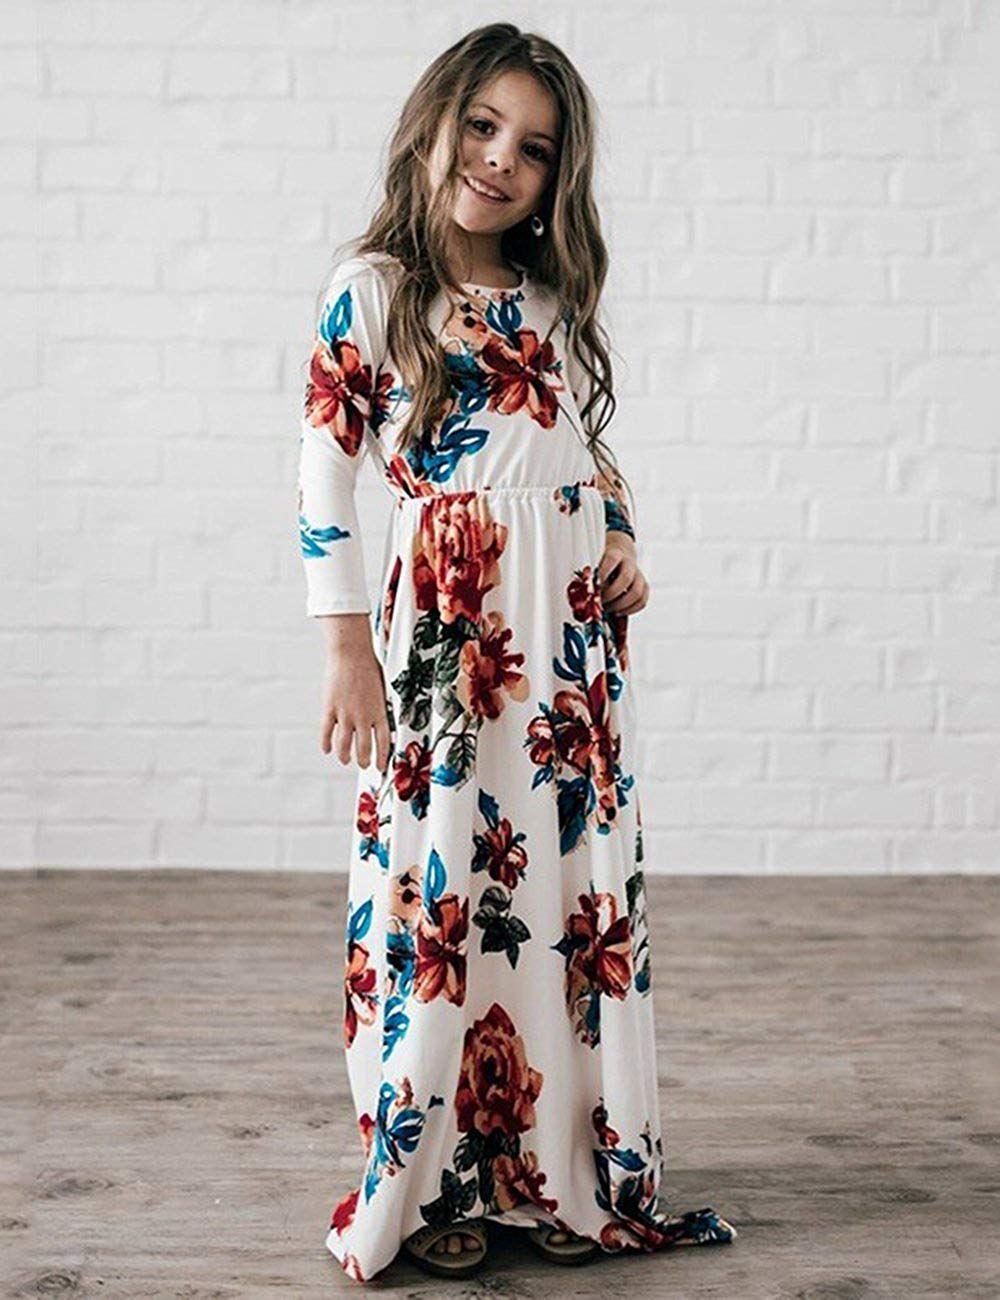 Best For The Stylish Kids Girls Floral Maxi Dress Kids Casual 3 4 Sleeve T Shirt Dresses Pocket For Toddlers 6 Girls Maxi Dresses Maxi Dress Basic Maxi Dress [ 1300 x 1000 Pixel ]